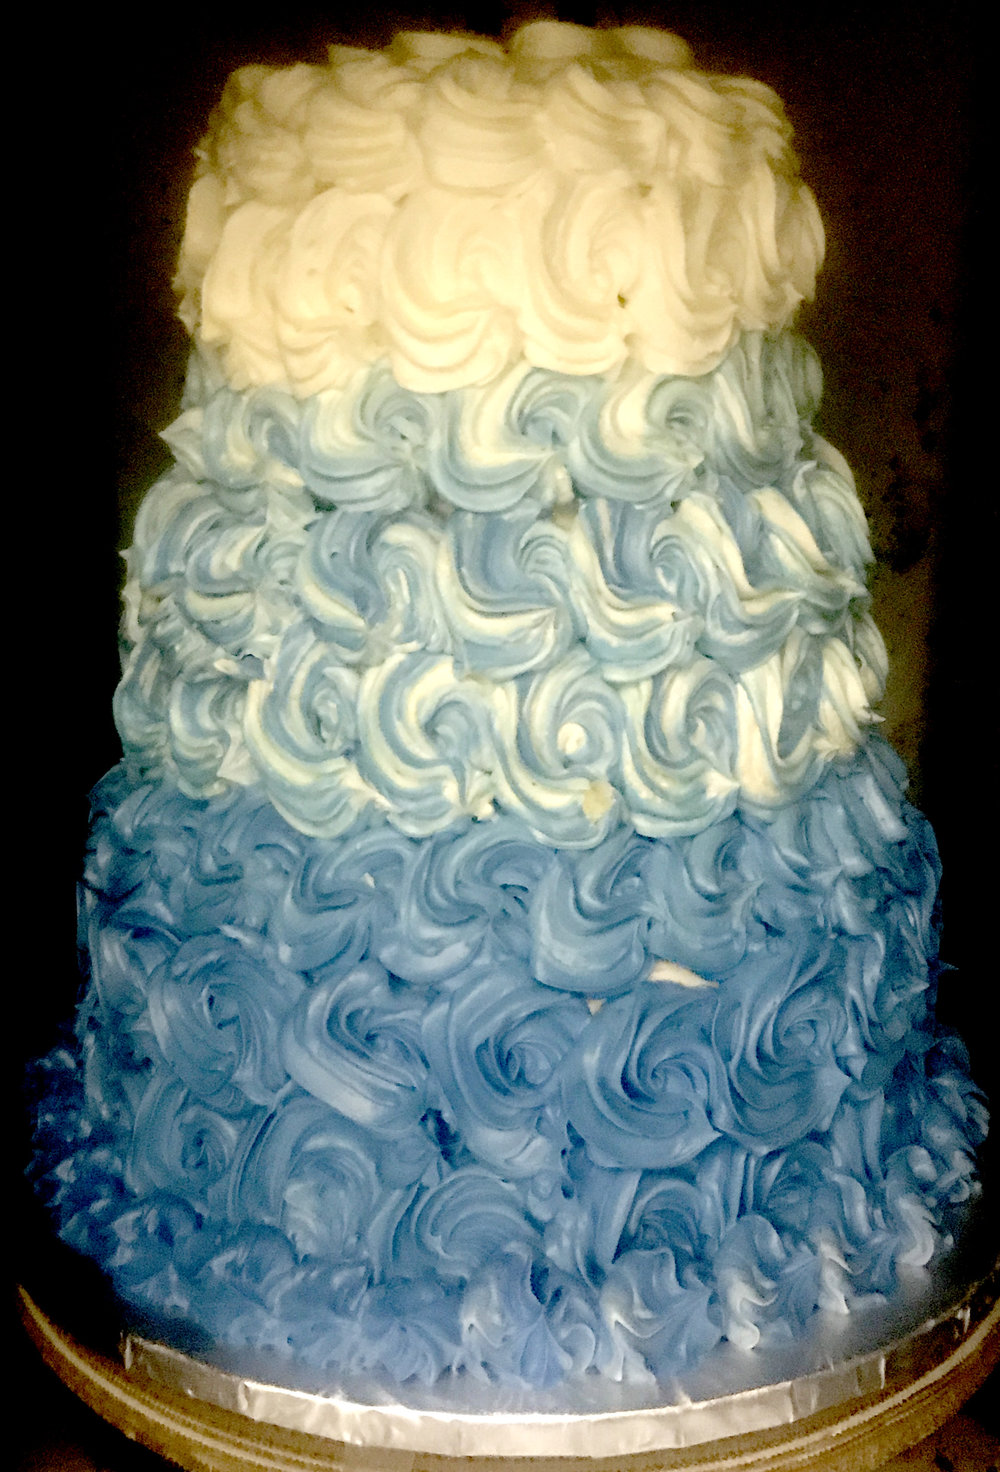 blue-birthday-cake-hmb-bakery.jpg